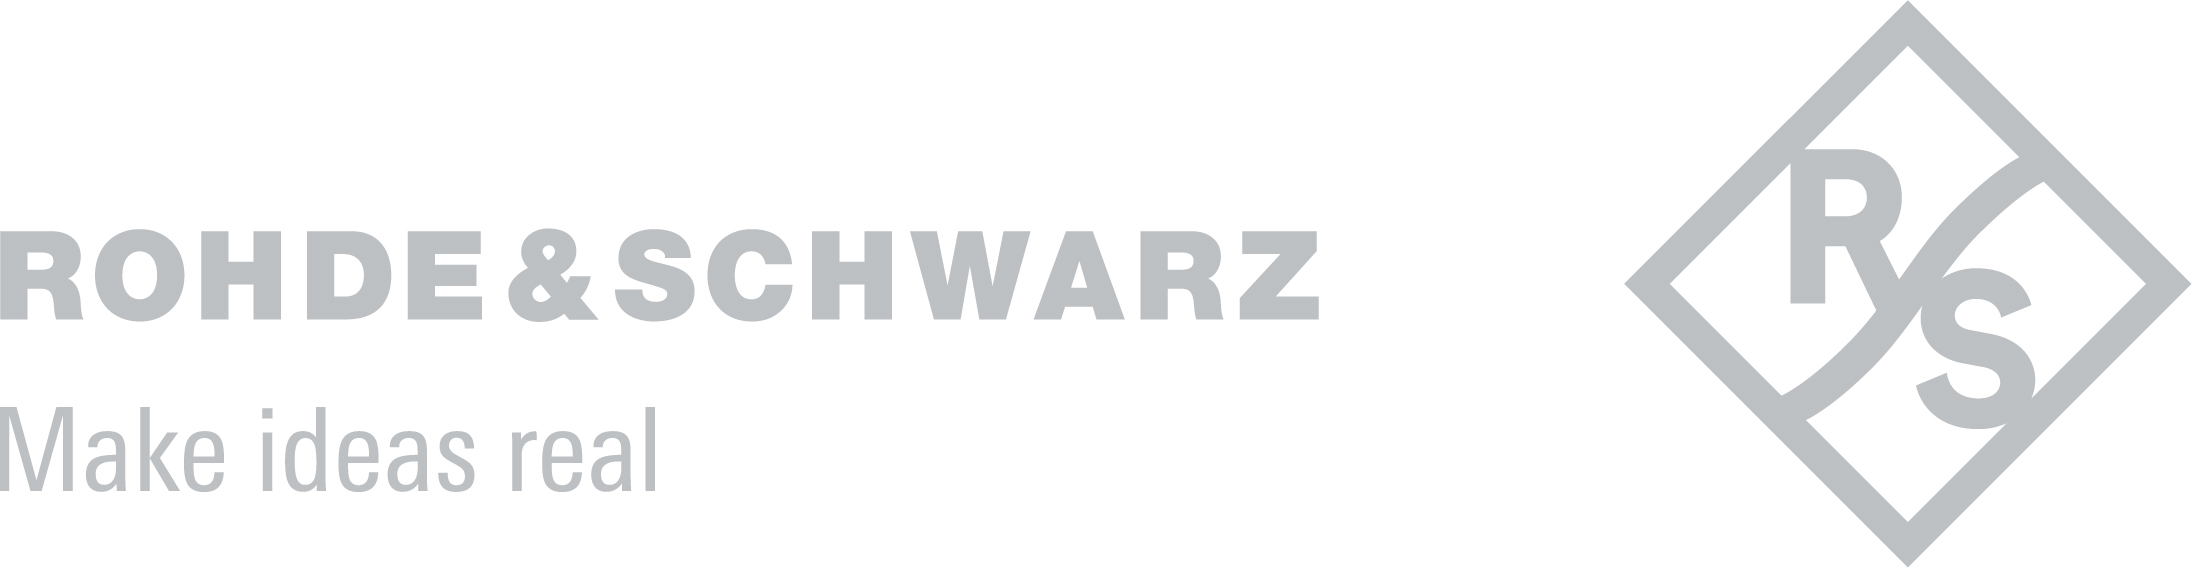 Rohde & Schwarz silver logo